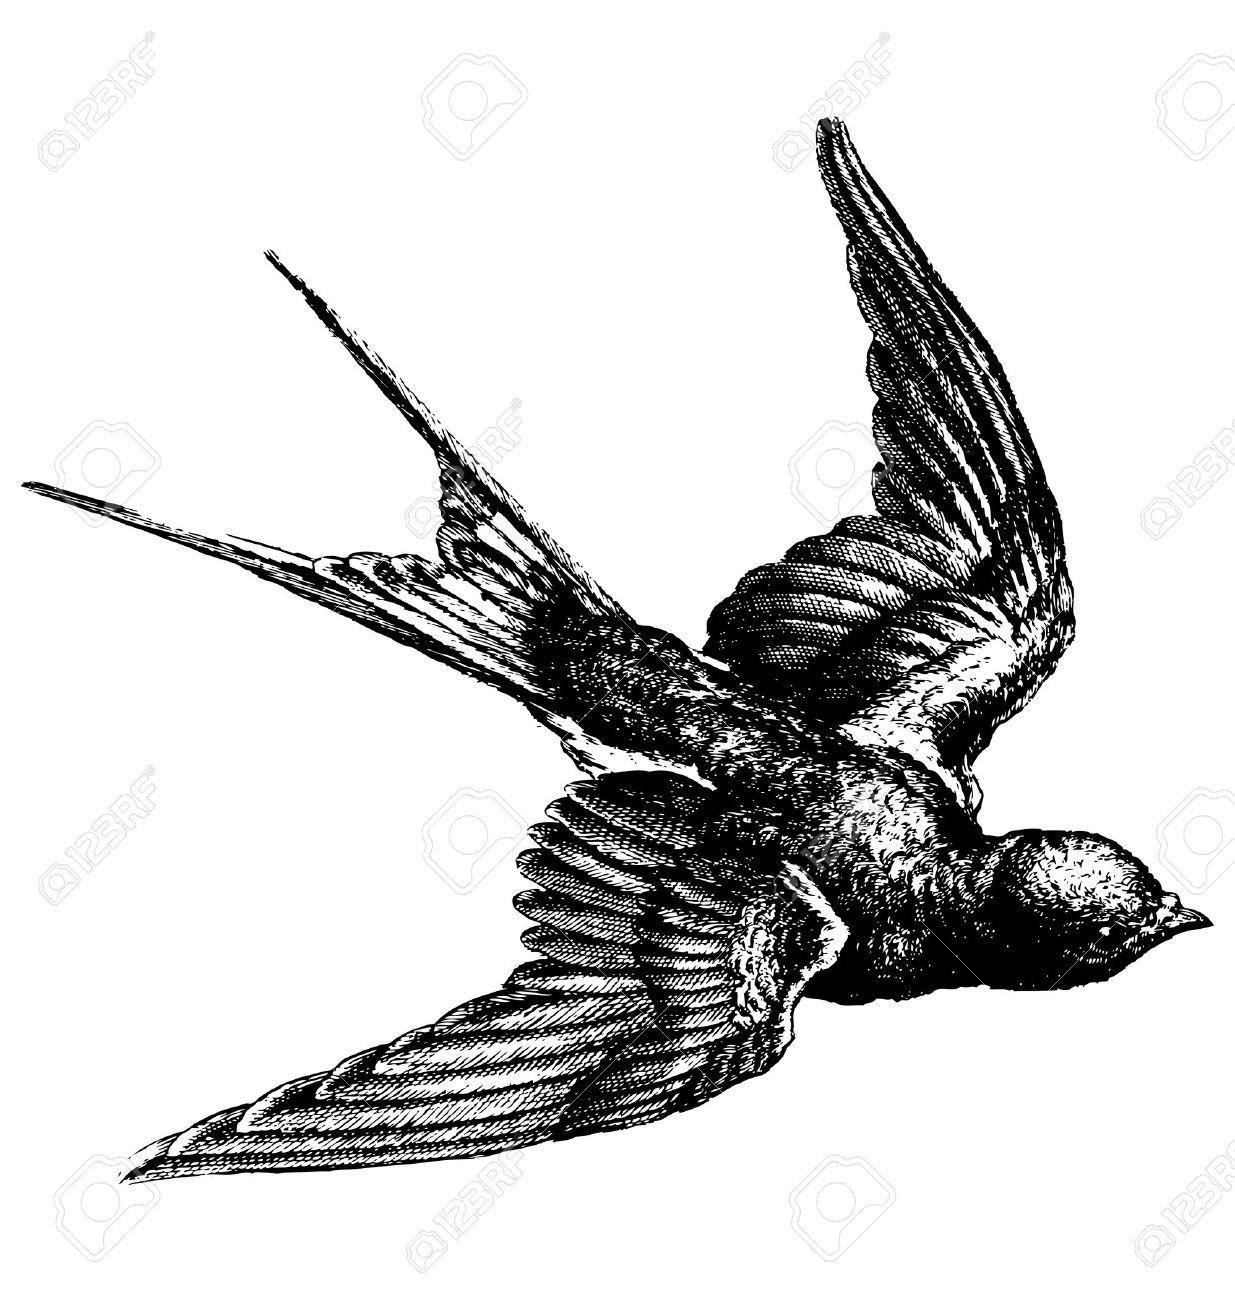 Flock Of Birds Drawing